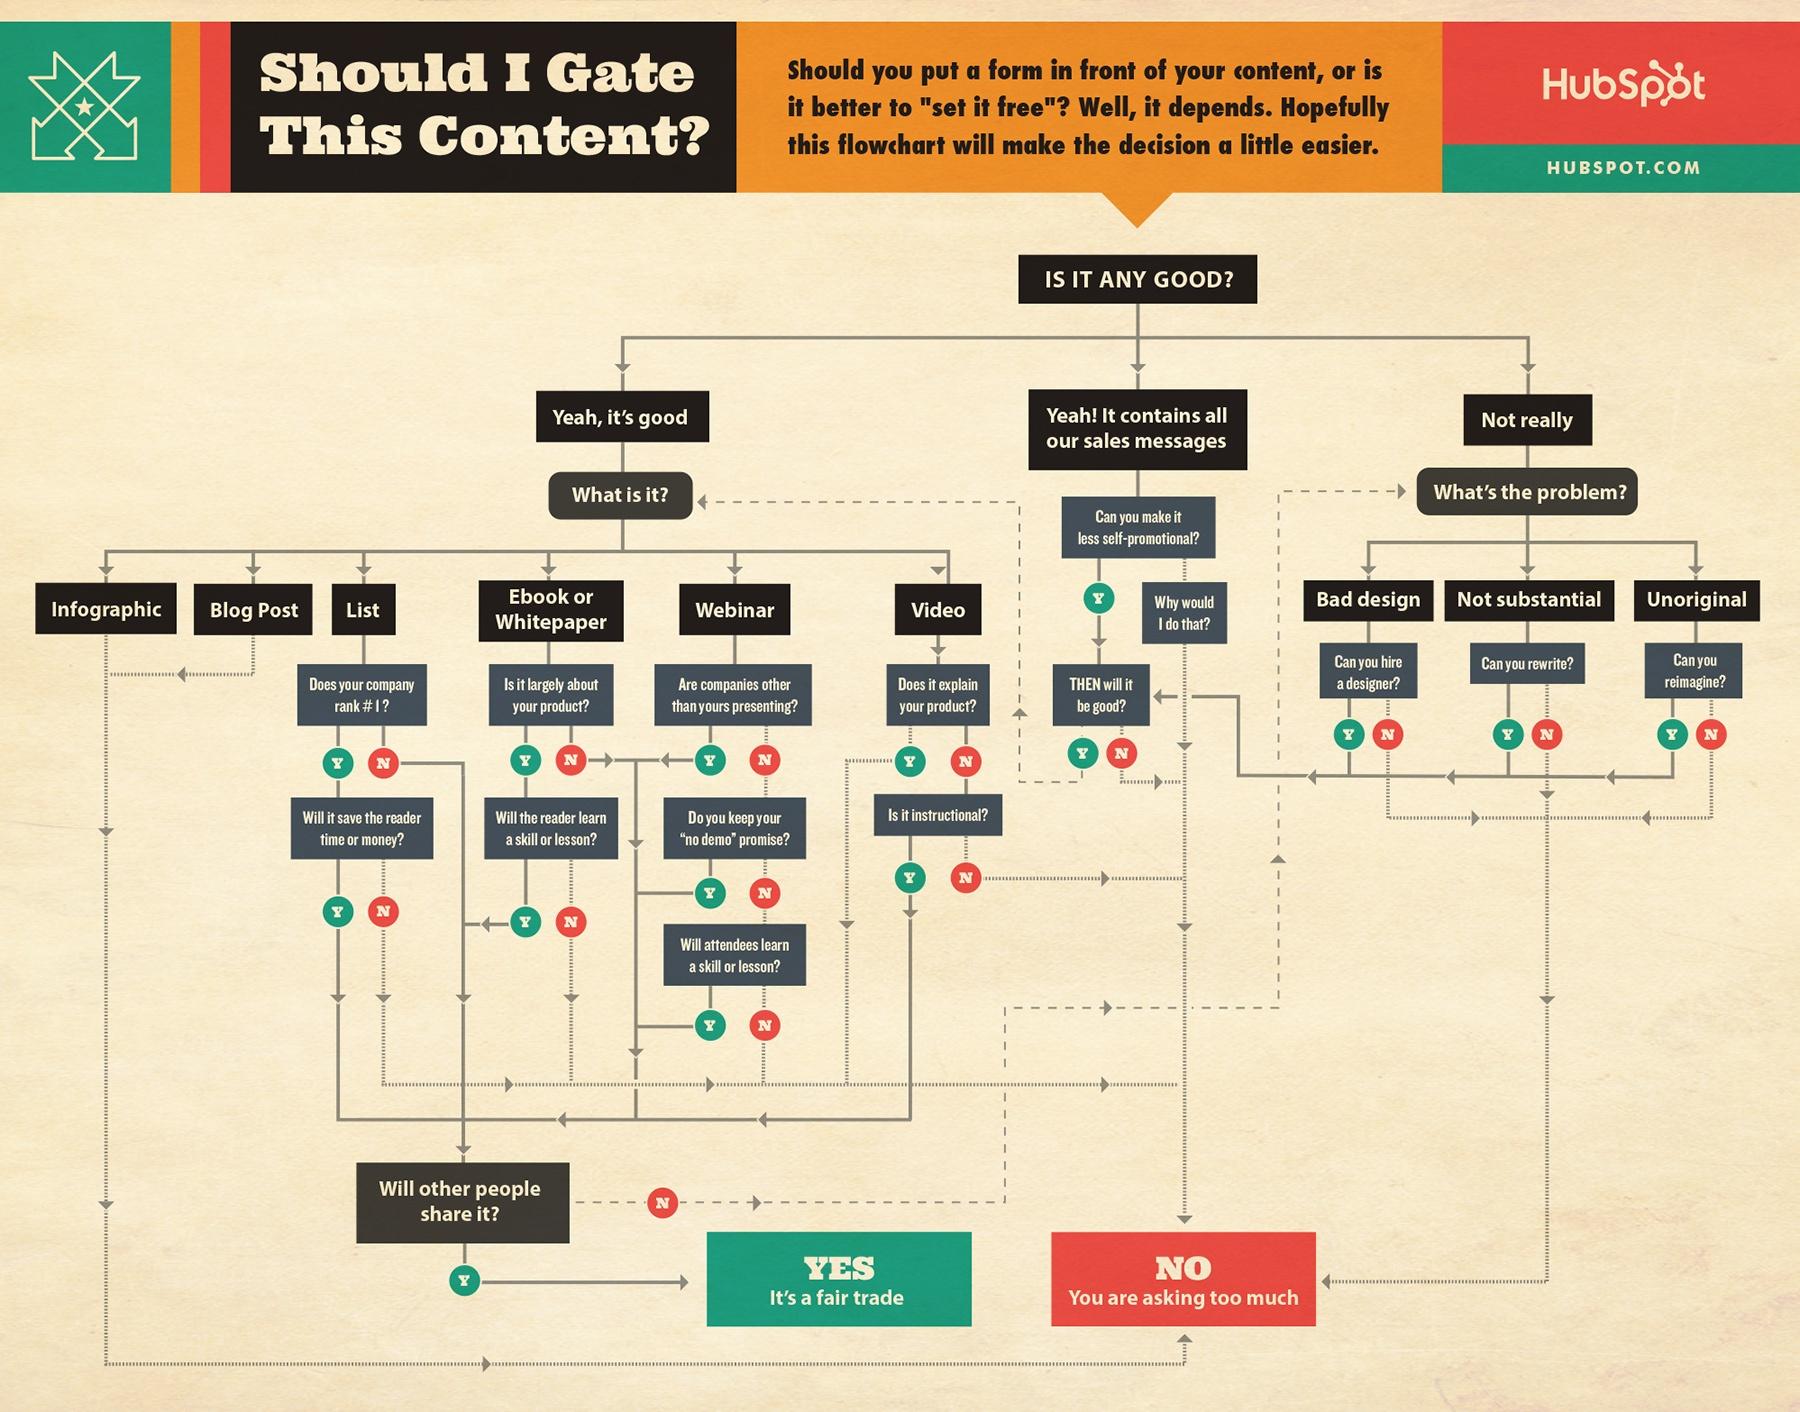 Should-I-Gate-Content-Flowchart-HubSpot.jpg